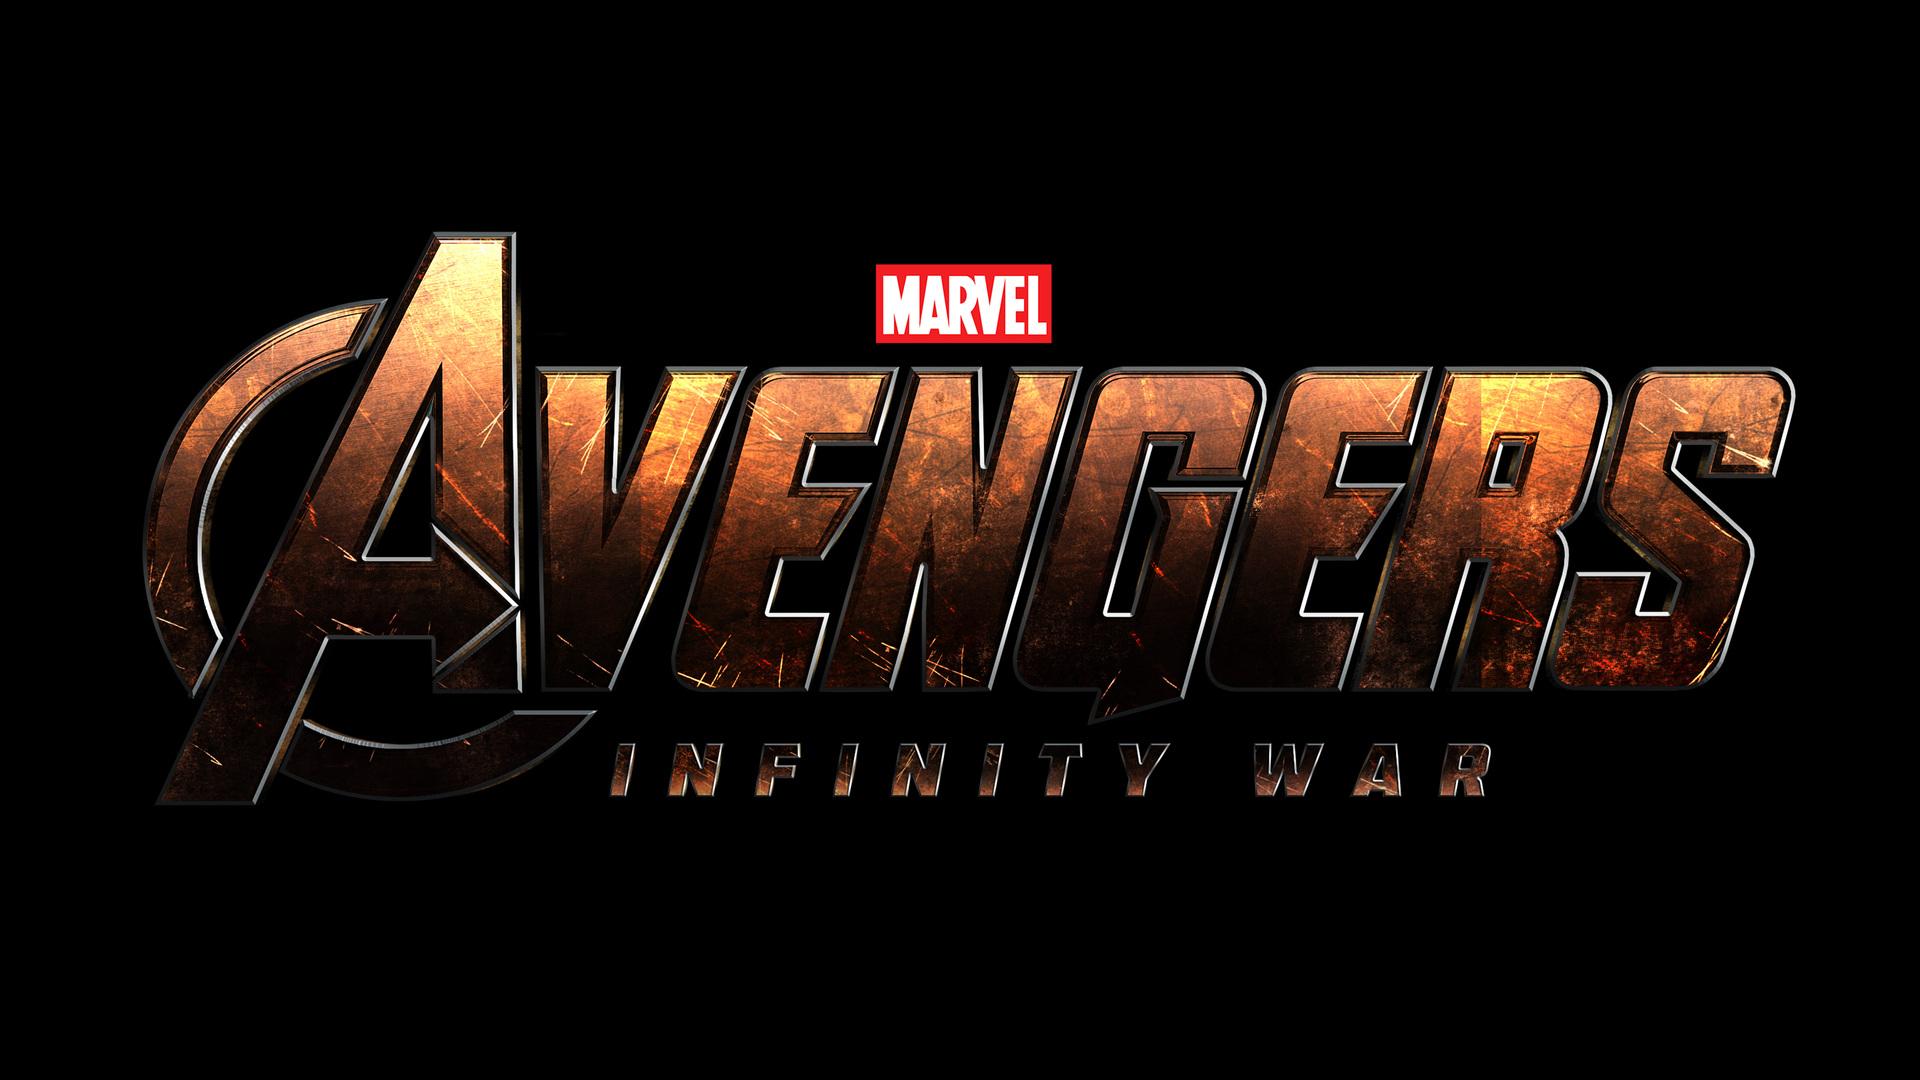 1920x1080 avengers infinity war 4k logo laptop full hd - Avengers a logo 4k ...